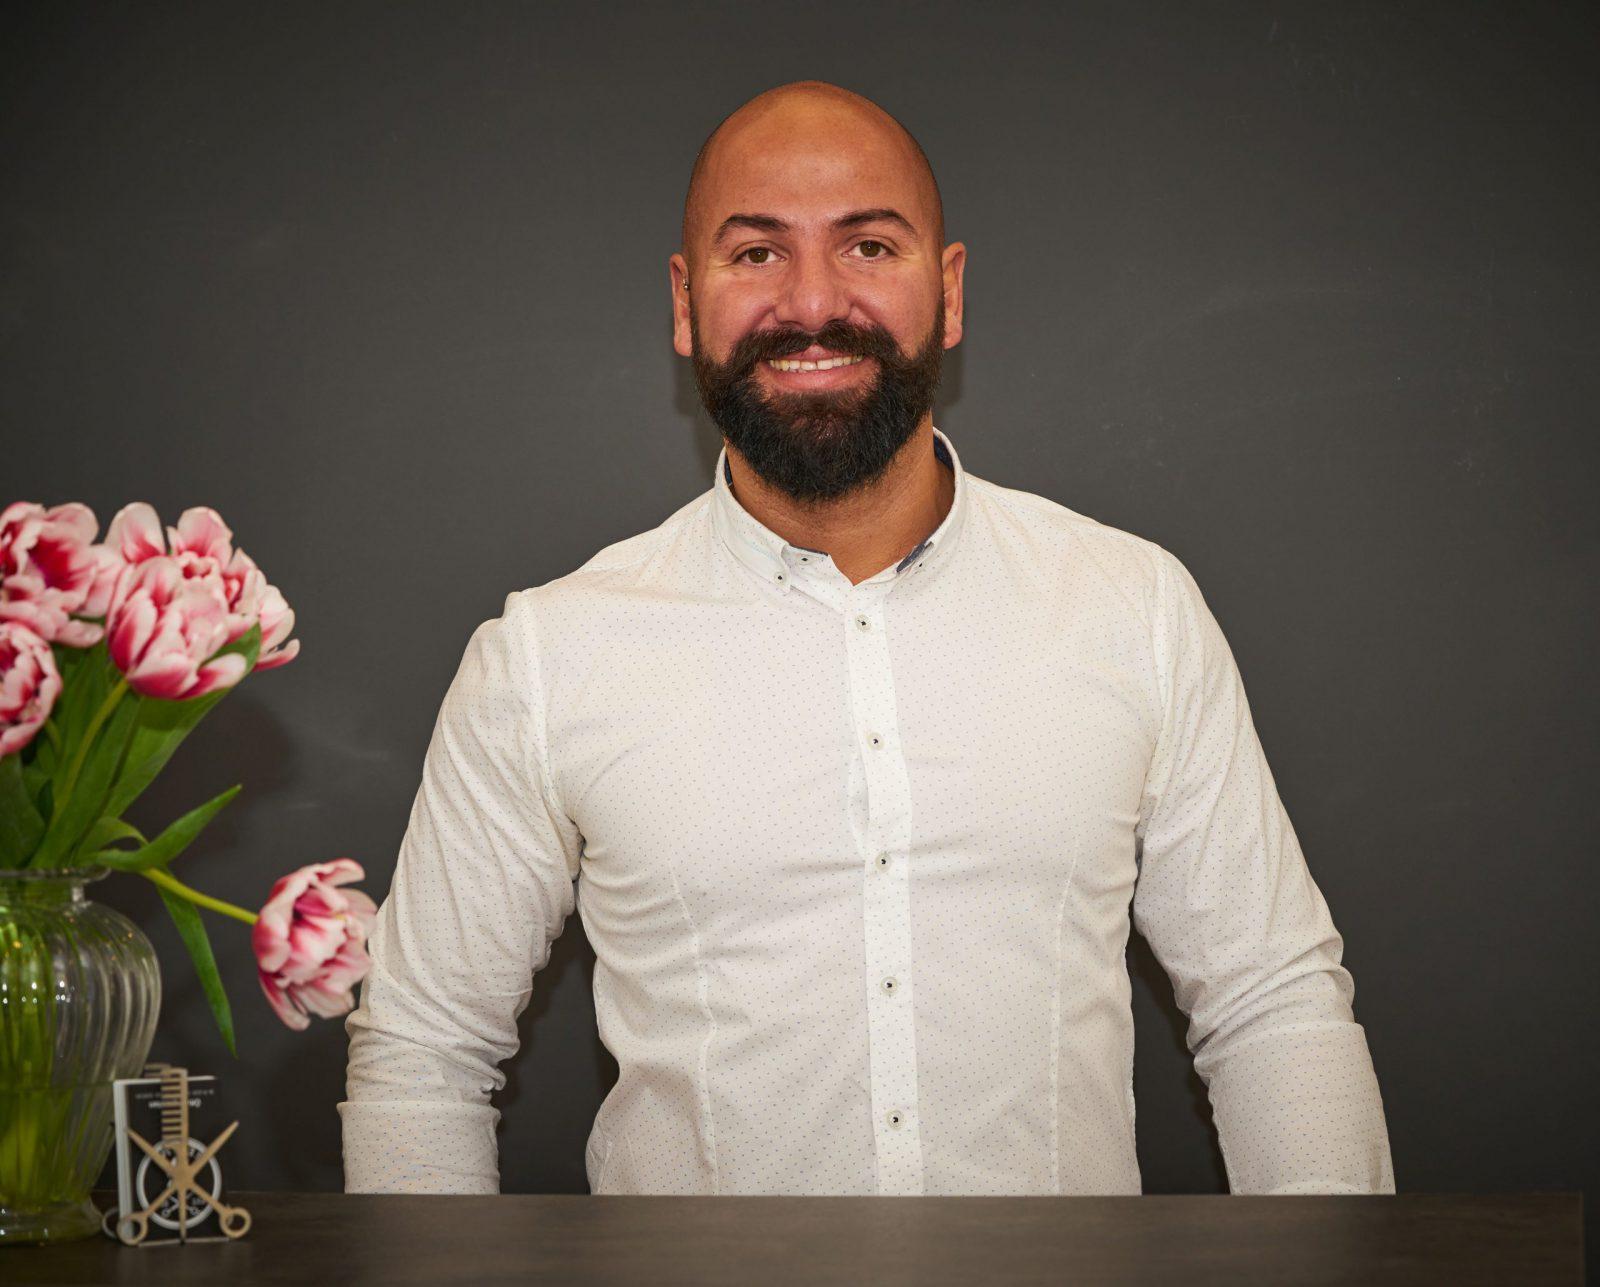 Friseurmeister Selim Uzer